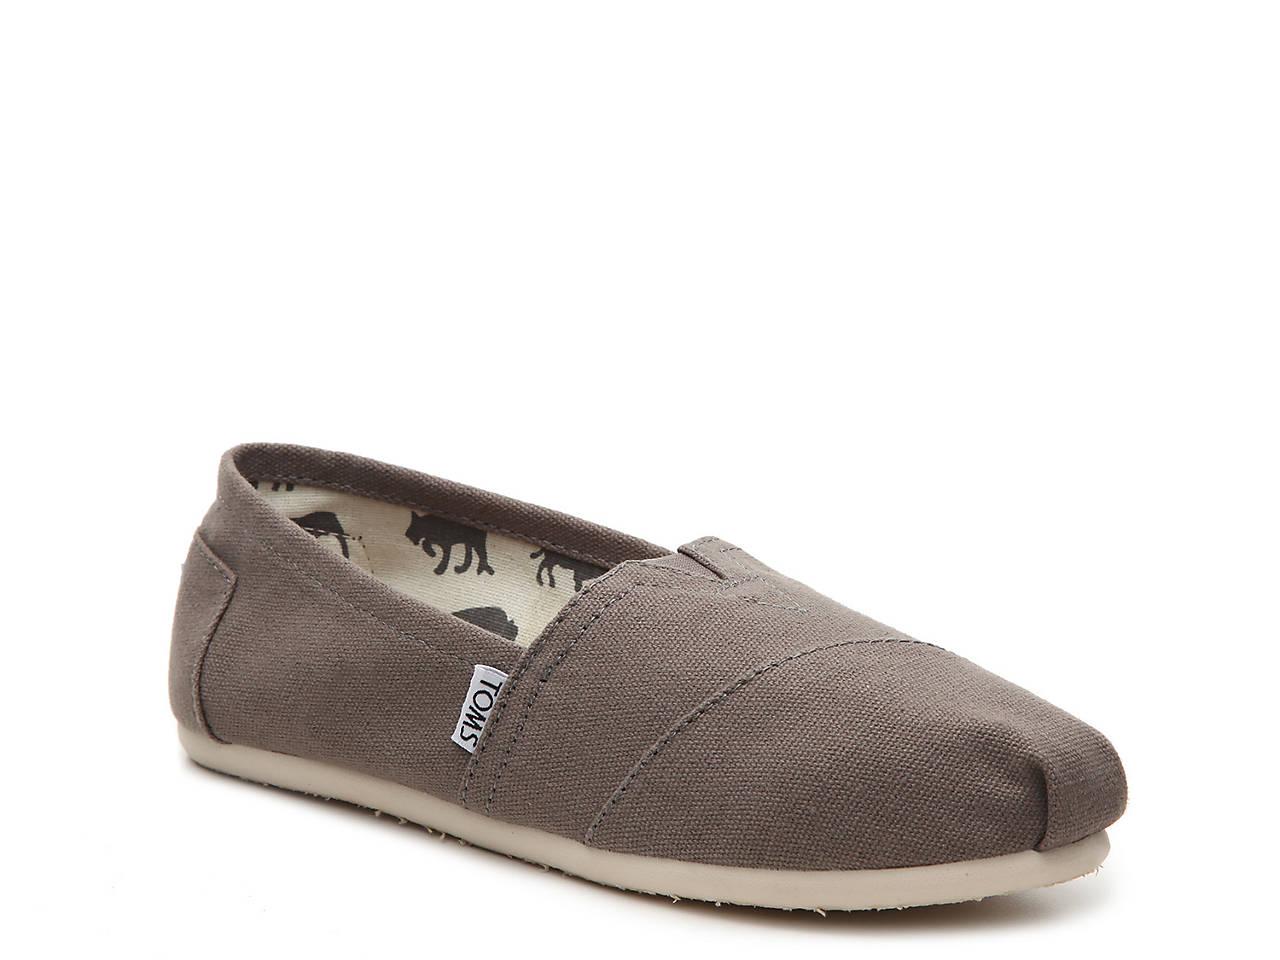 46d5451f955b TOMS Alpargata Slip-On Women s Shoes